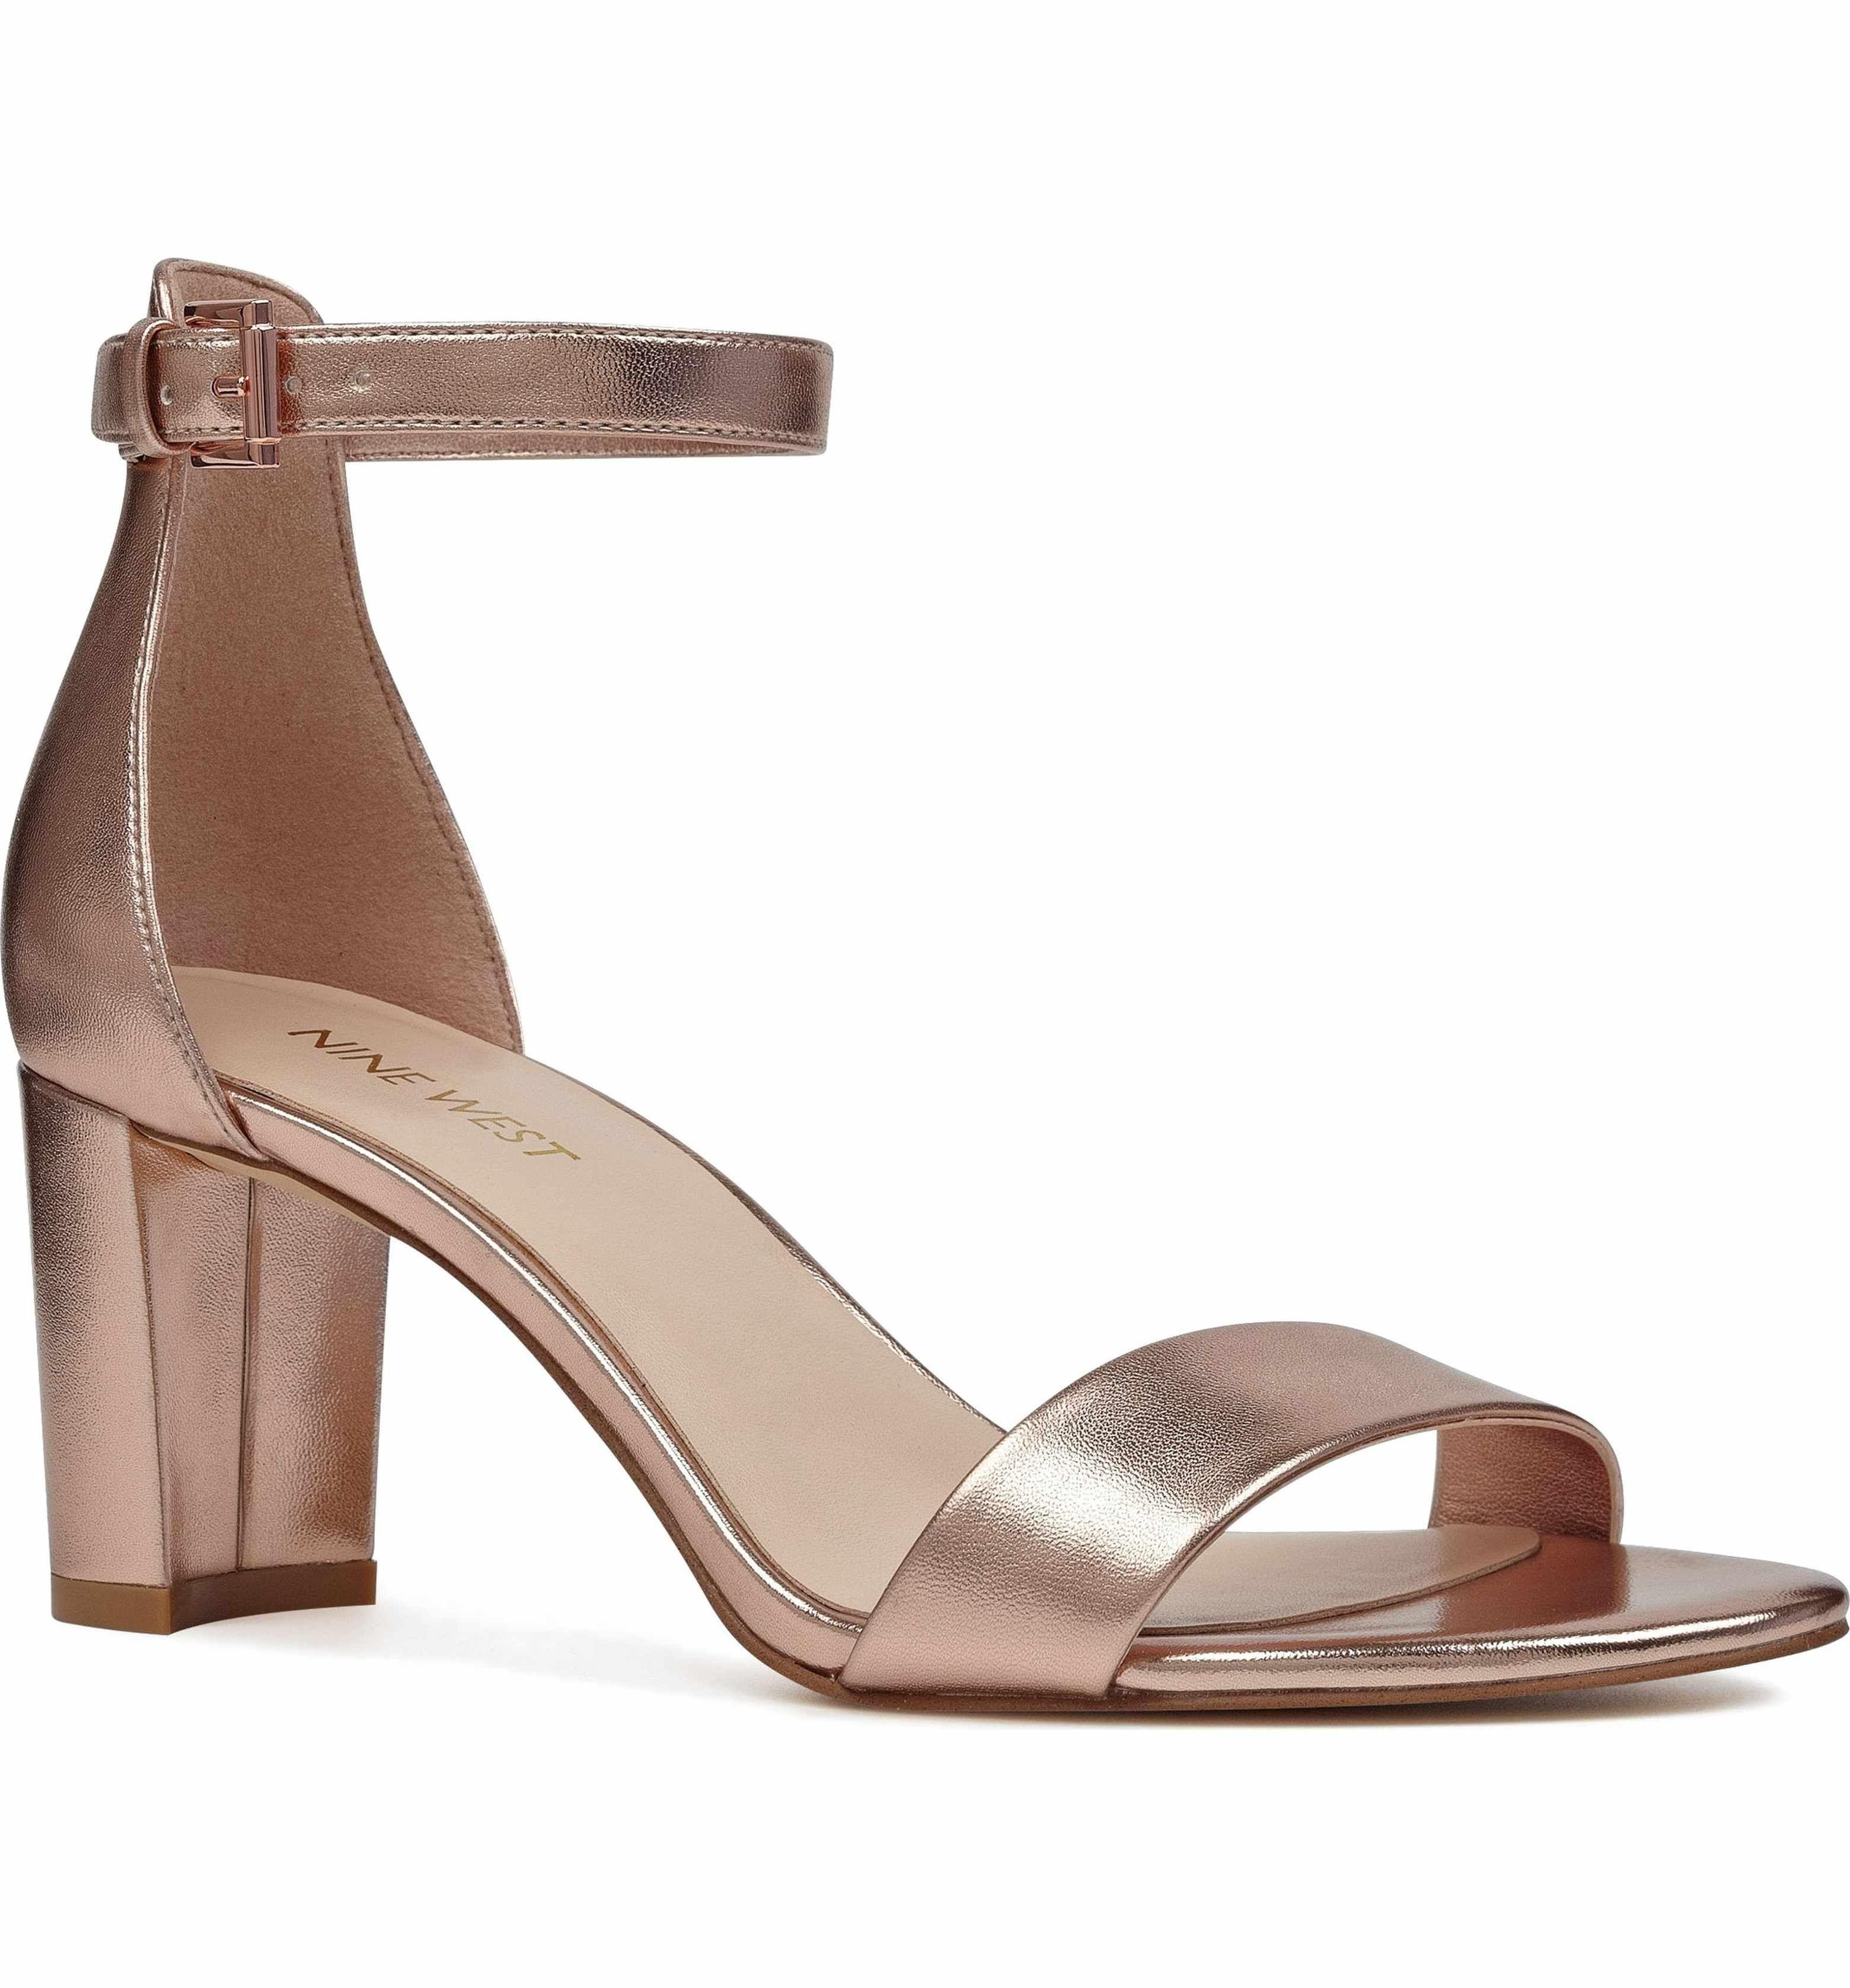 5cd70e7d833 Main Image - Nine West Pruce Ankle Strap Sandal (Women)